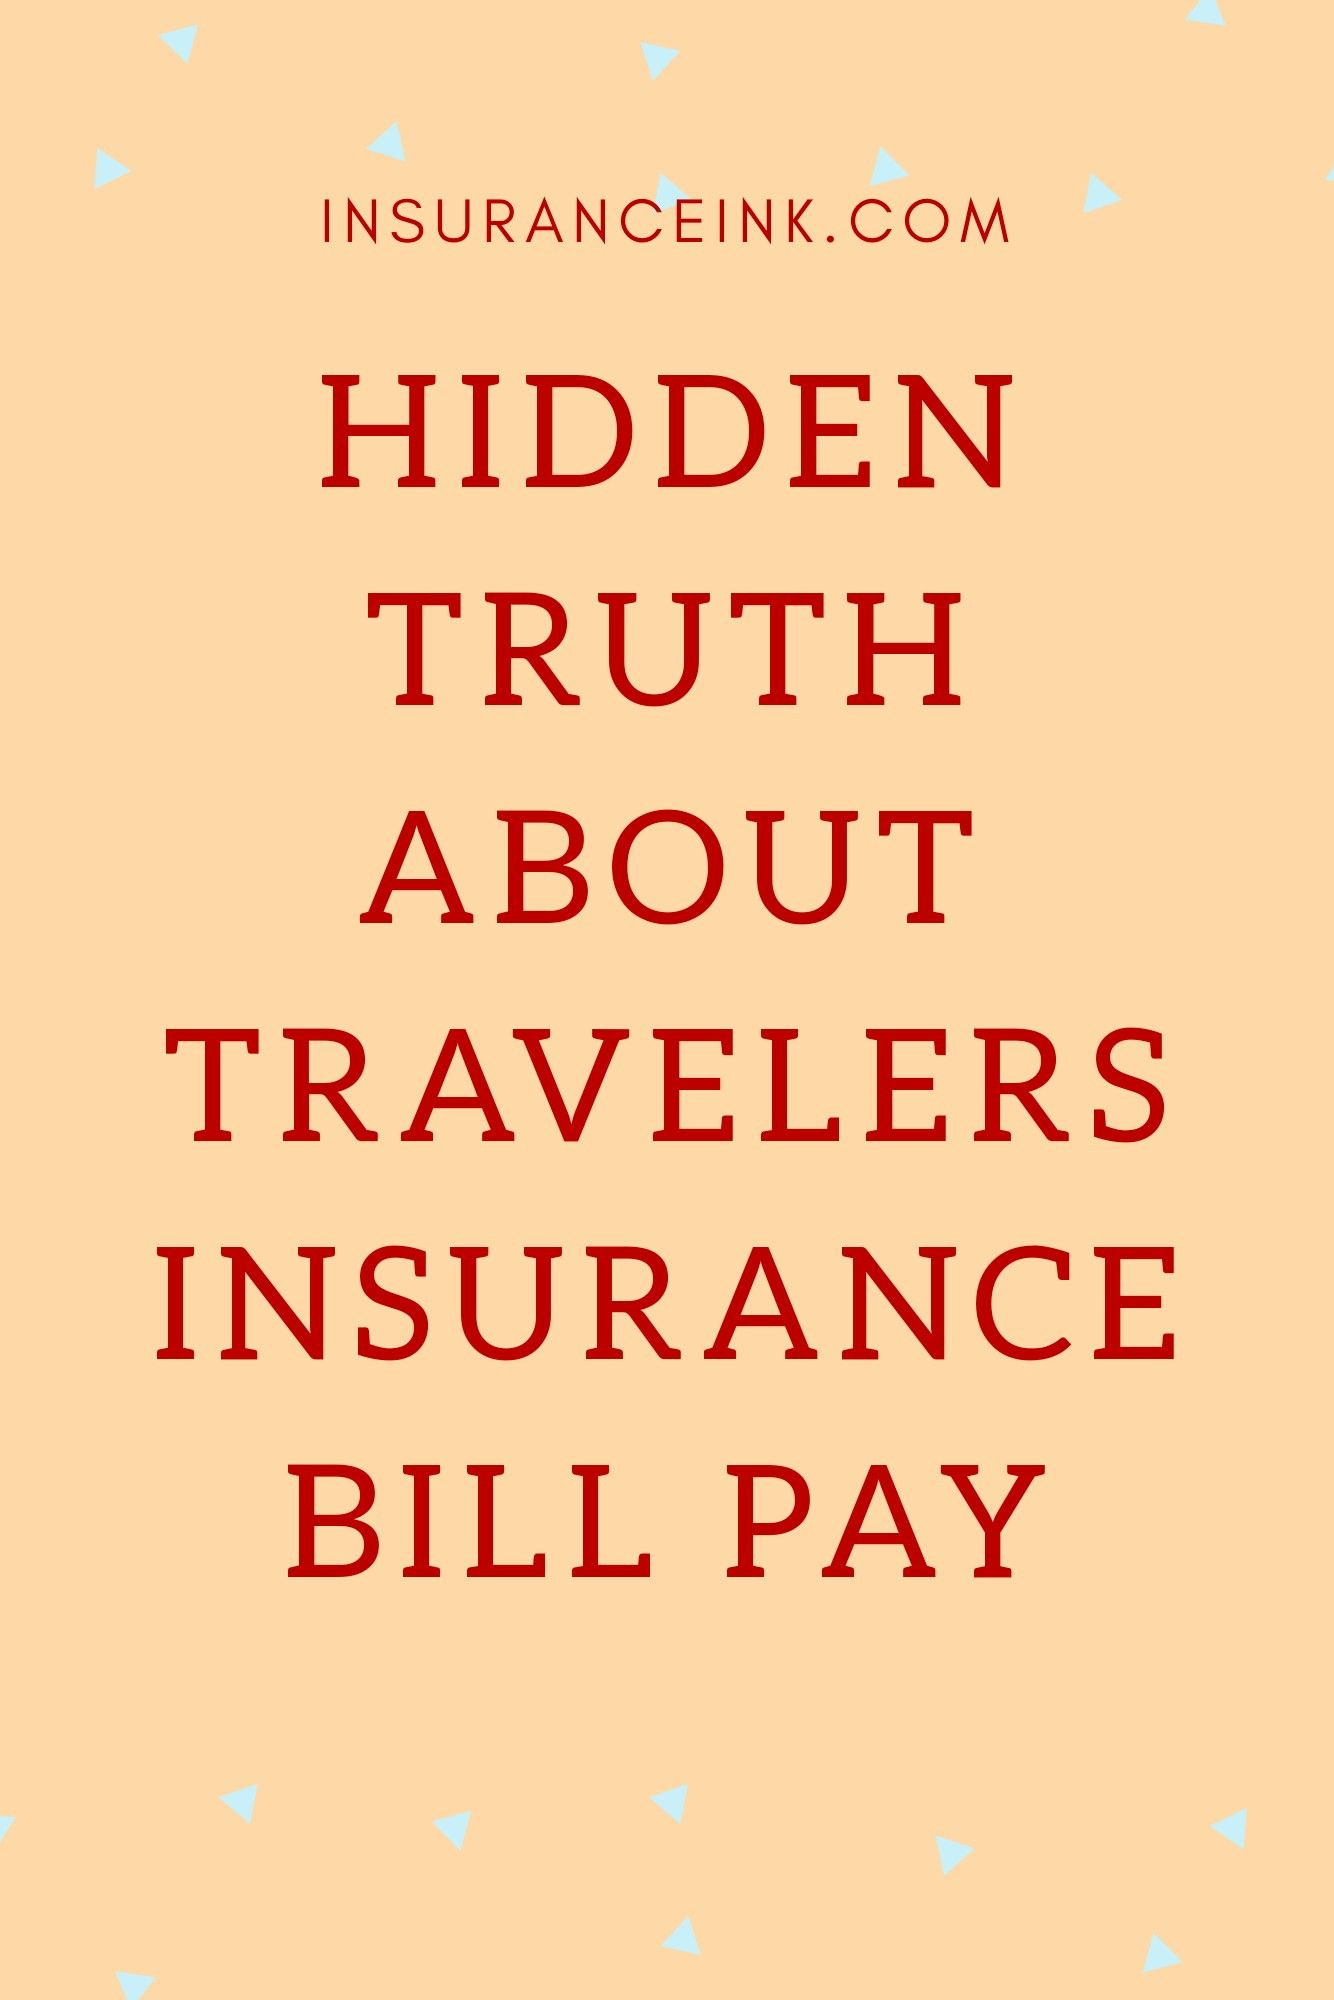 Travelers Insurance Bill Pay Travel Insurance Paying Bills